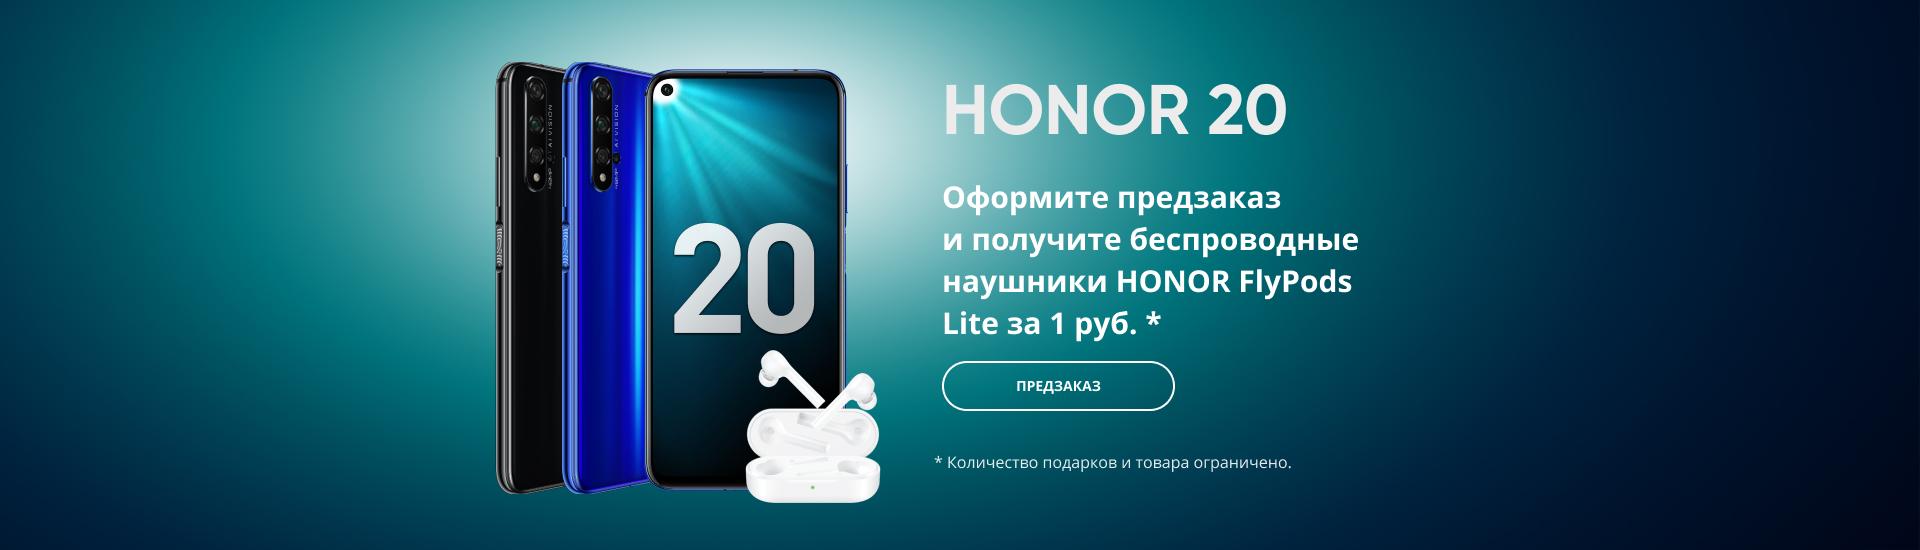 Honor 20 предзаказ